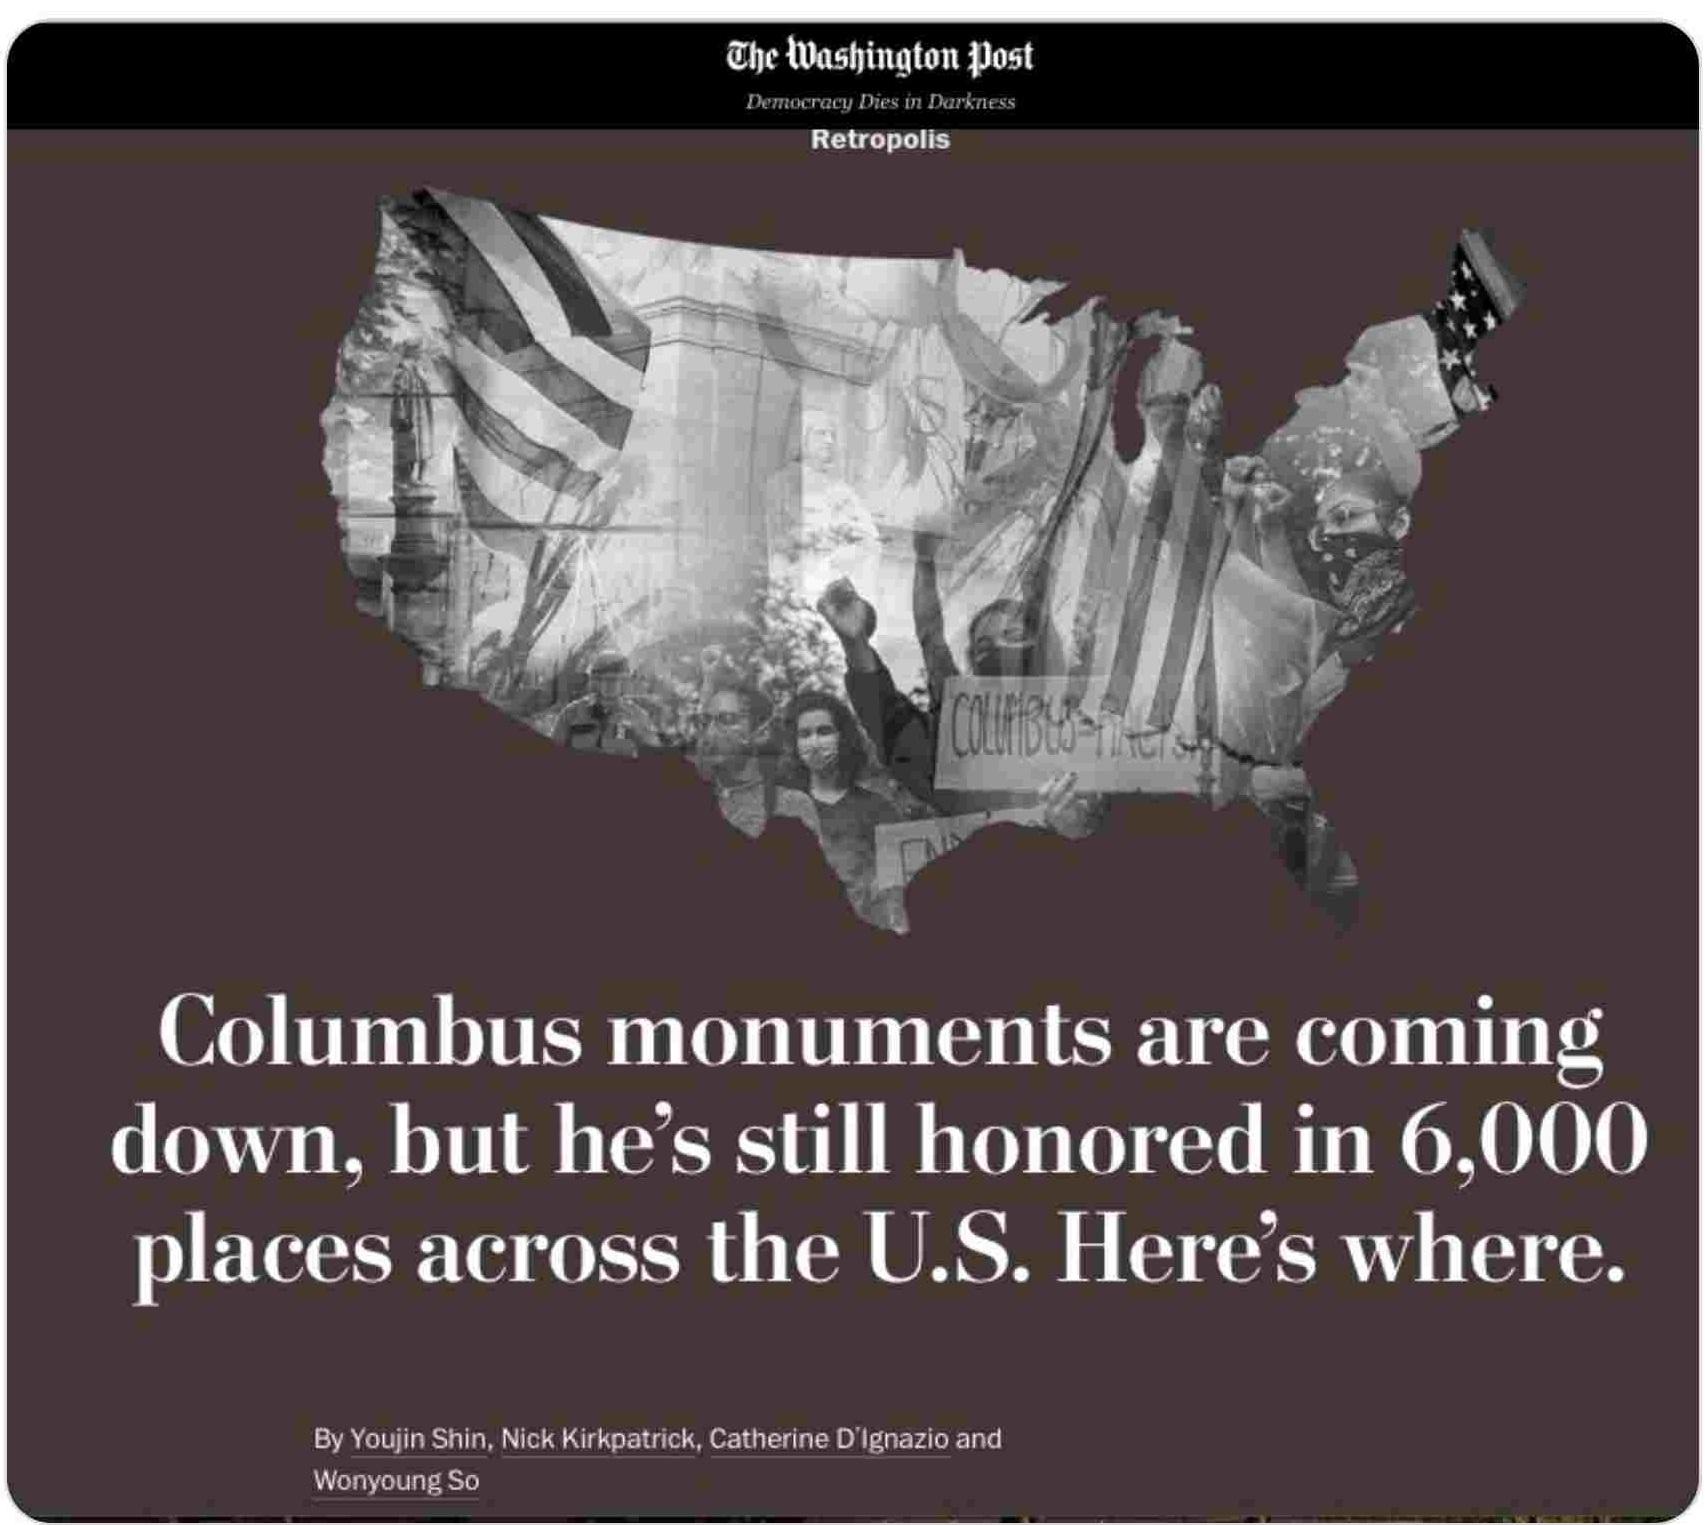 wapo_list_of_columbus_statues_10-11-2021